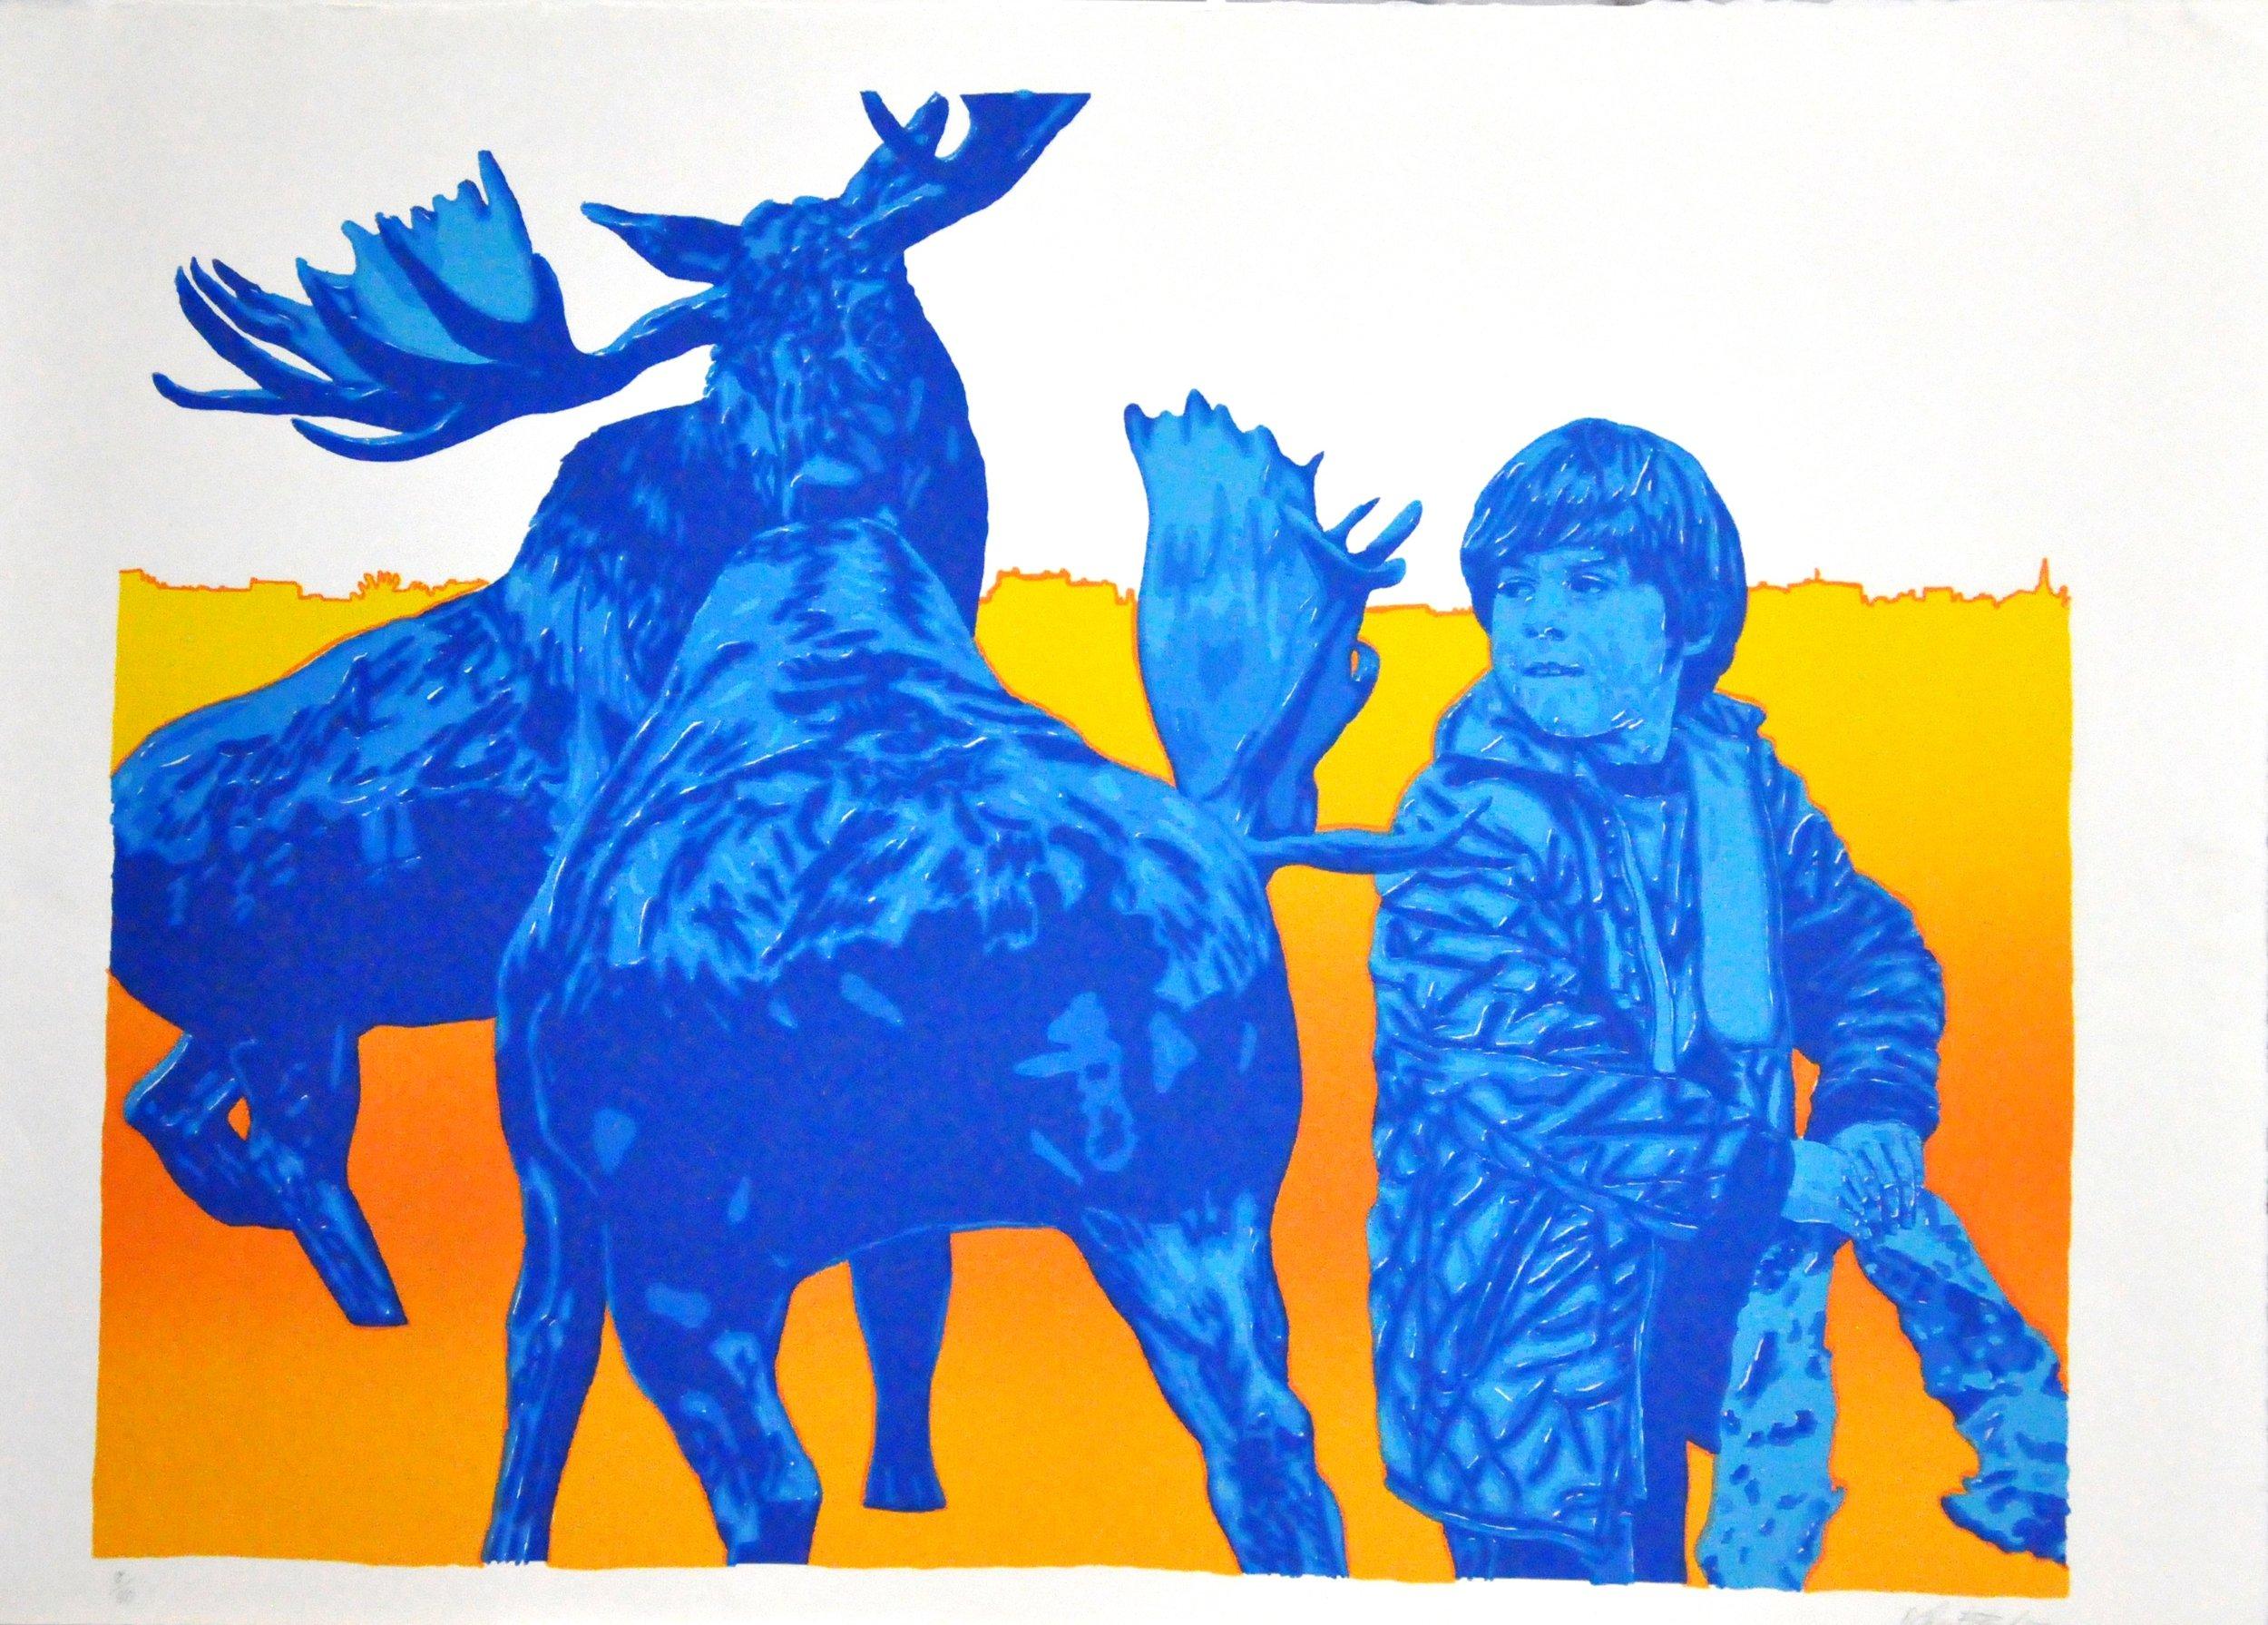 "Blue Moose,  1973, John Boyle, six colour lithograph, 22.4"" x 31.1"", 2008.02.09, Gift of the Canada Council Art Bank."